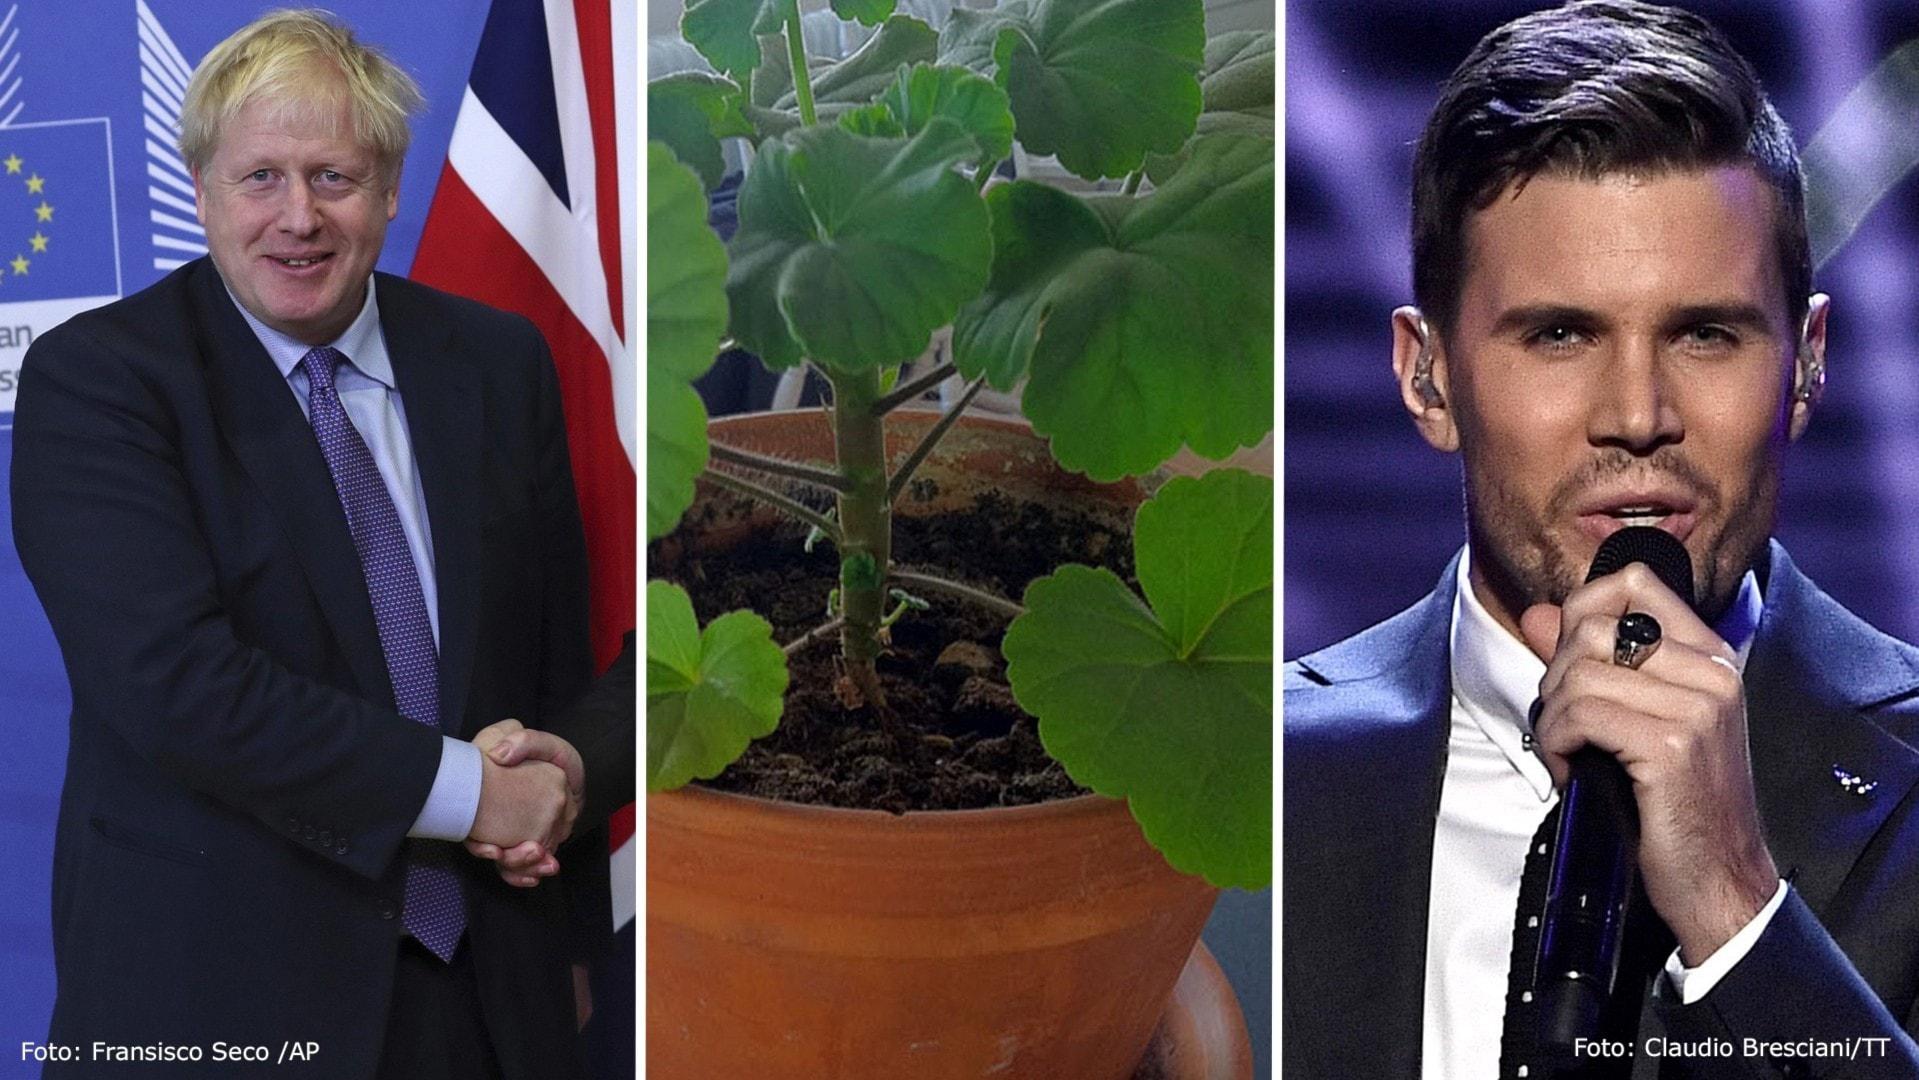 Brexit, blommor och Bengtsson